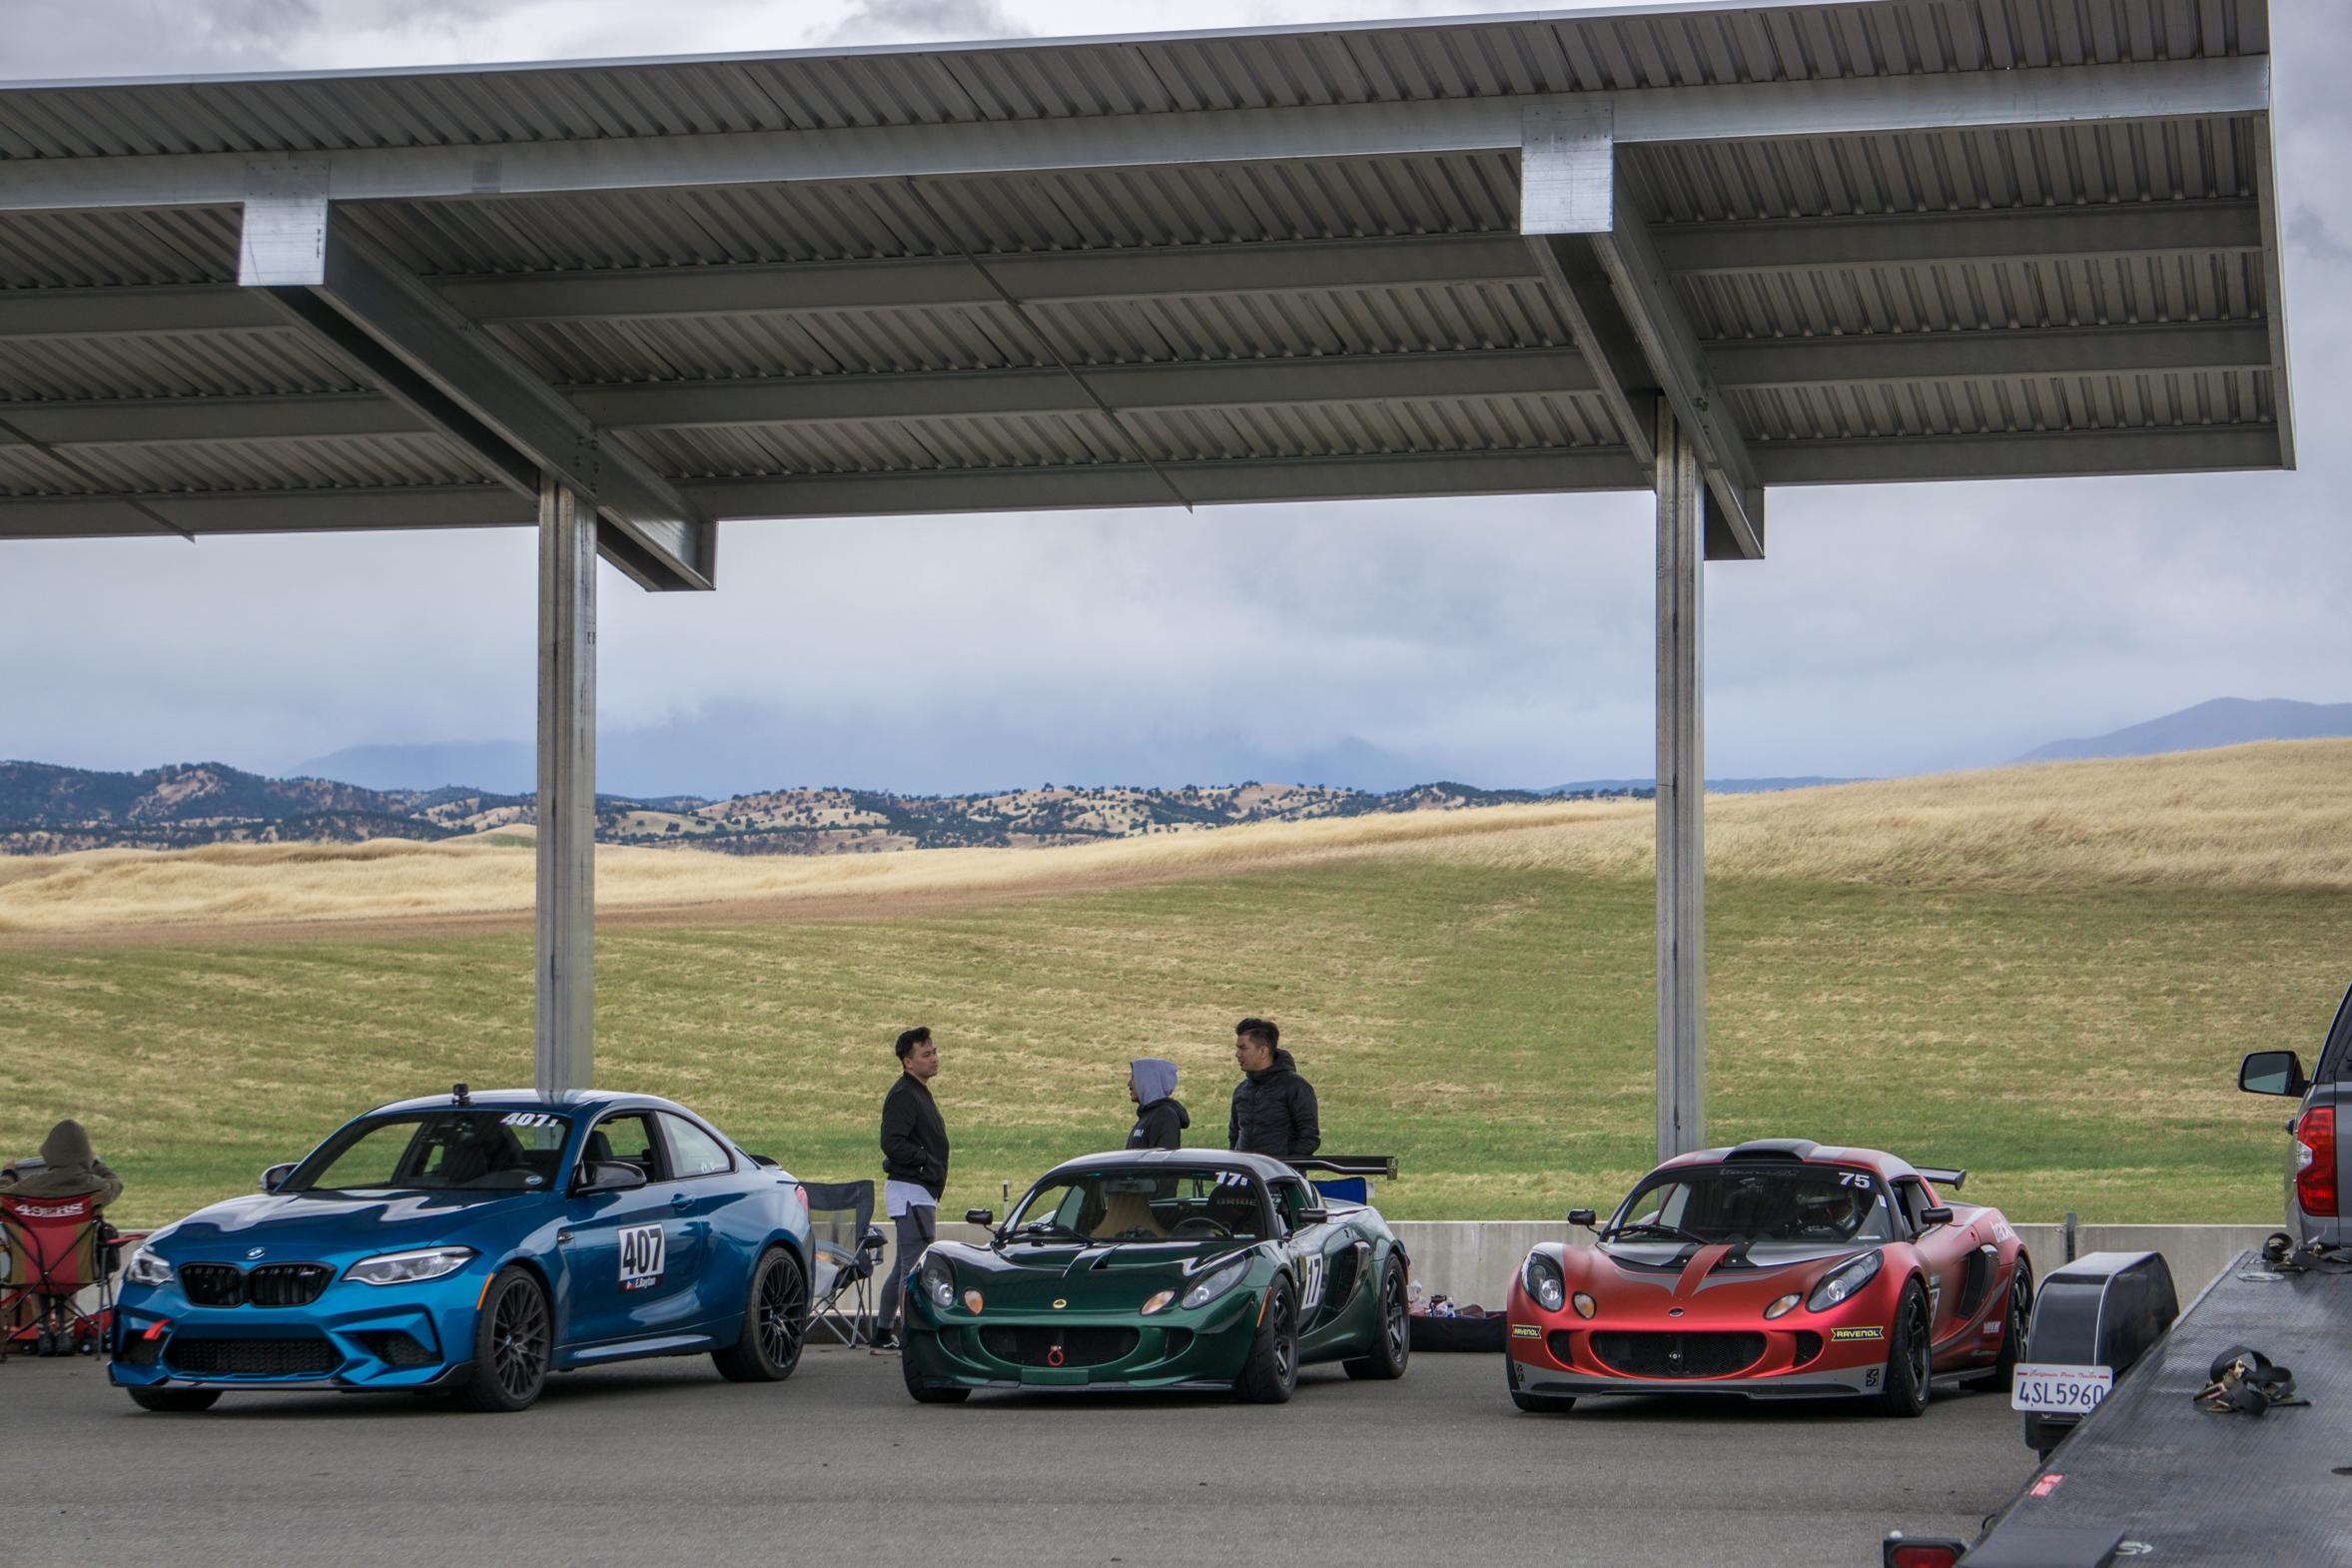 Trackspec Autosports Lotus Exige S240 Thunderhill